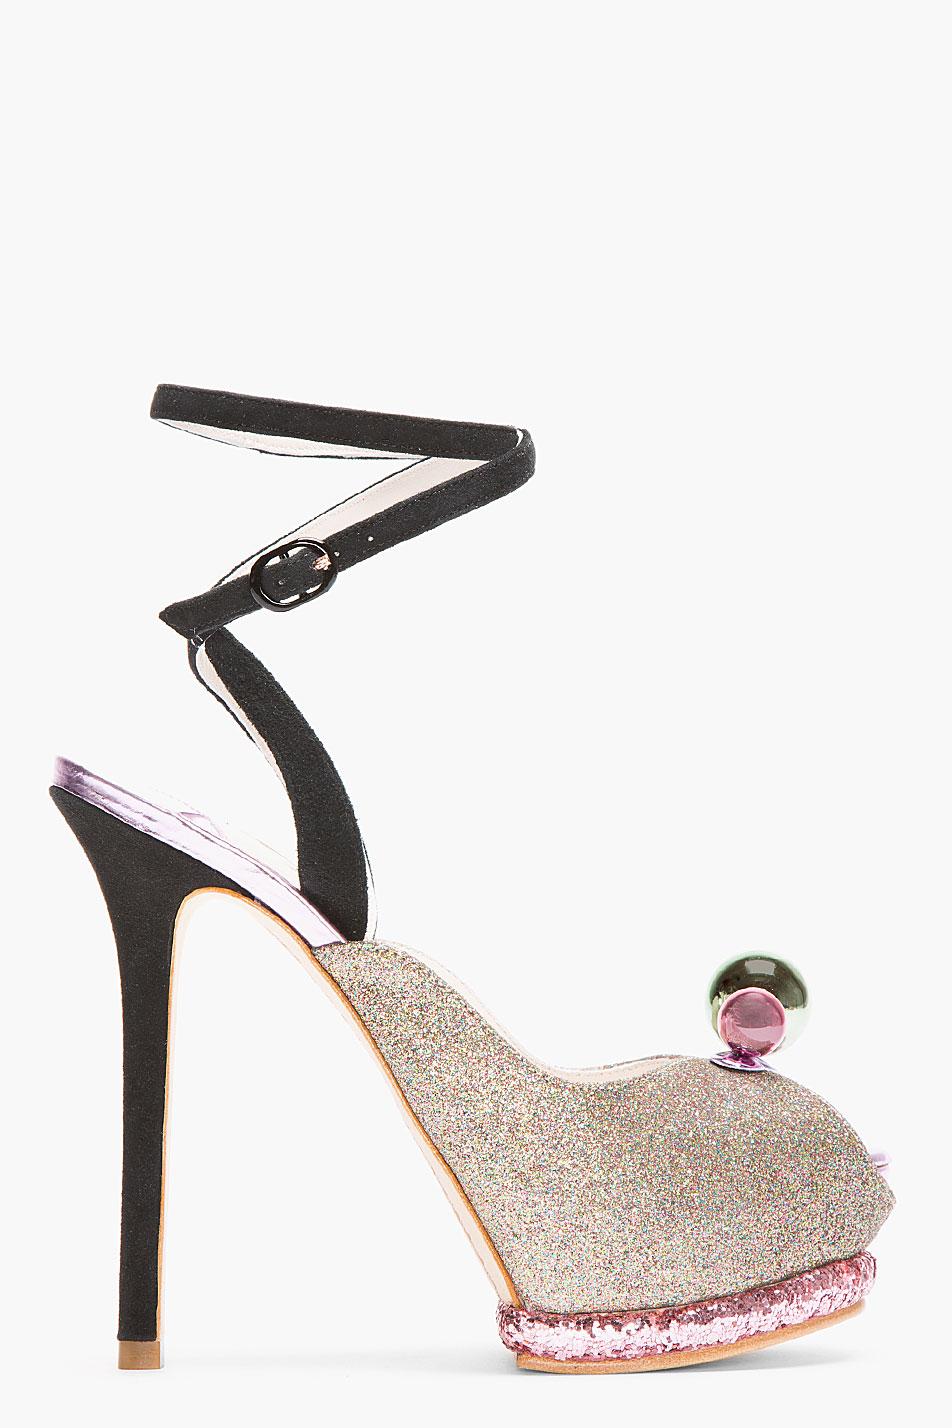 Sophia Webster Mauve Glitter Bardot Ankle Strap Heels Lyst